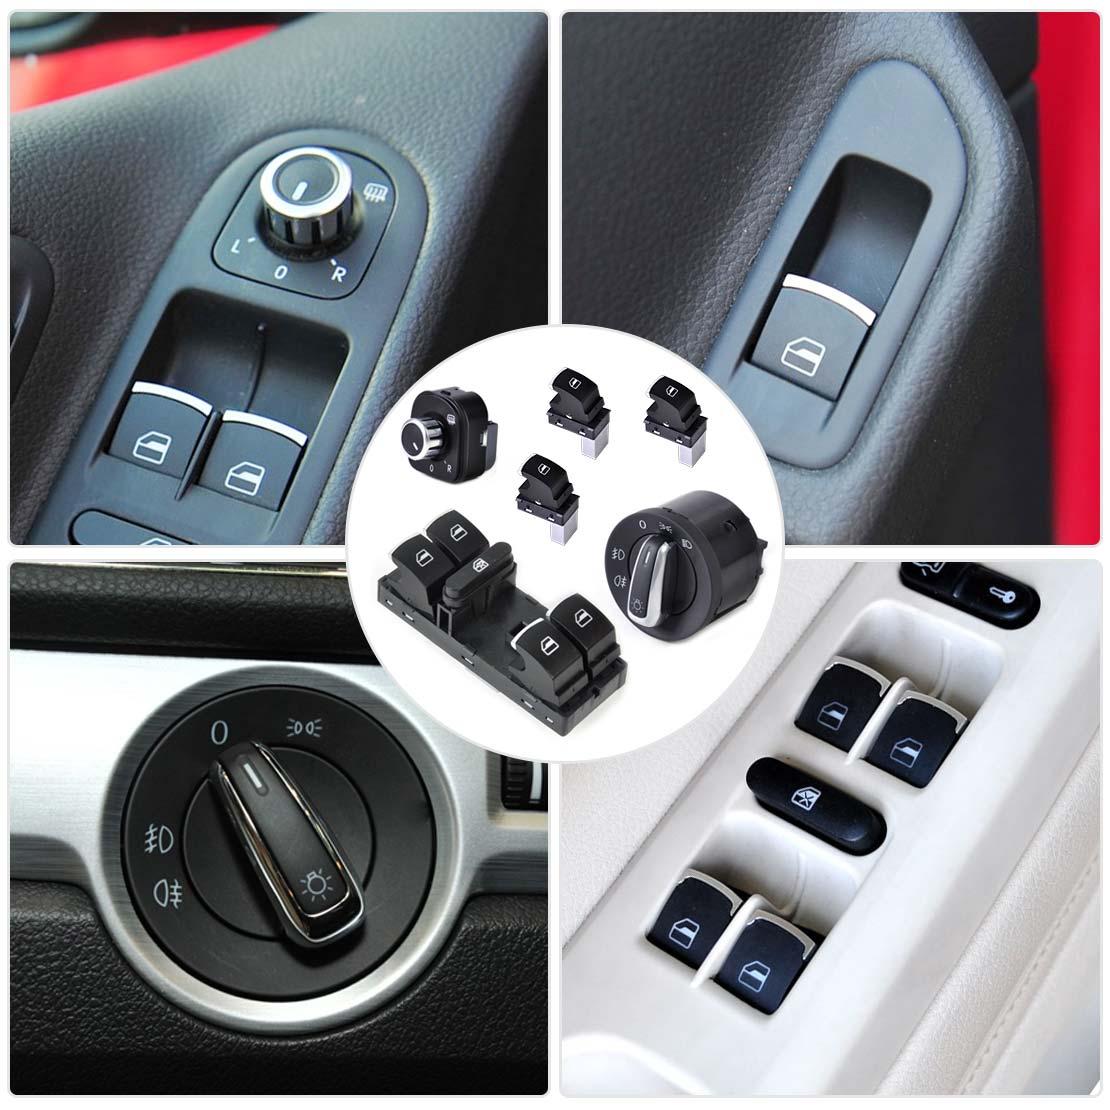 beler Headlight Mirror Window Switch Control Set for VW Golf Jetta GTI MK5 MK6 Passat B6 3C Rabbit Tiguan 5ND941431A 5ND959565B|headlight mirror|window switch|passat b6 3c - title=